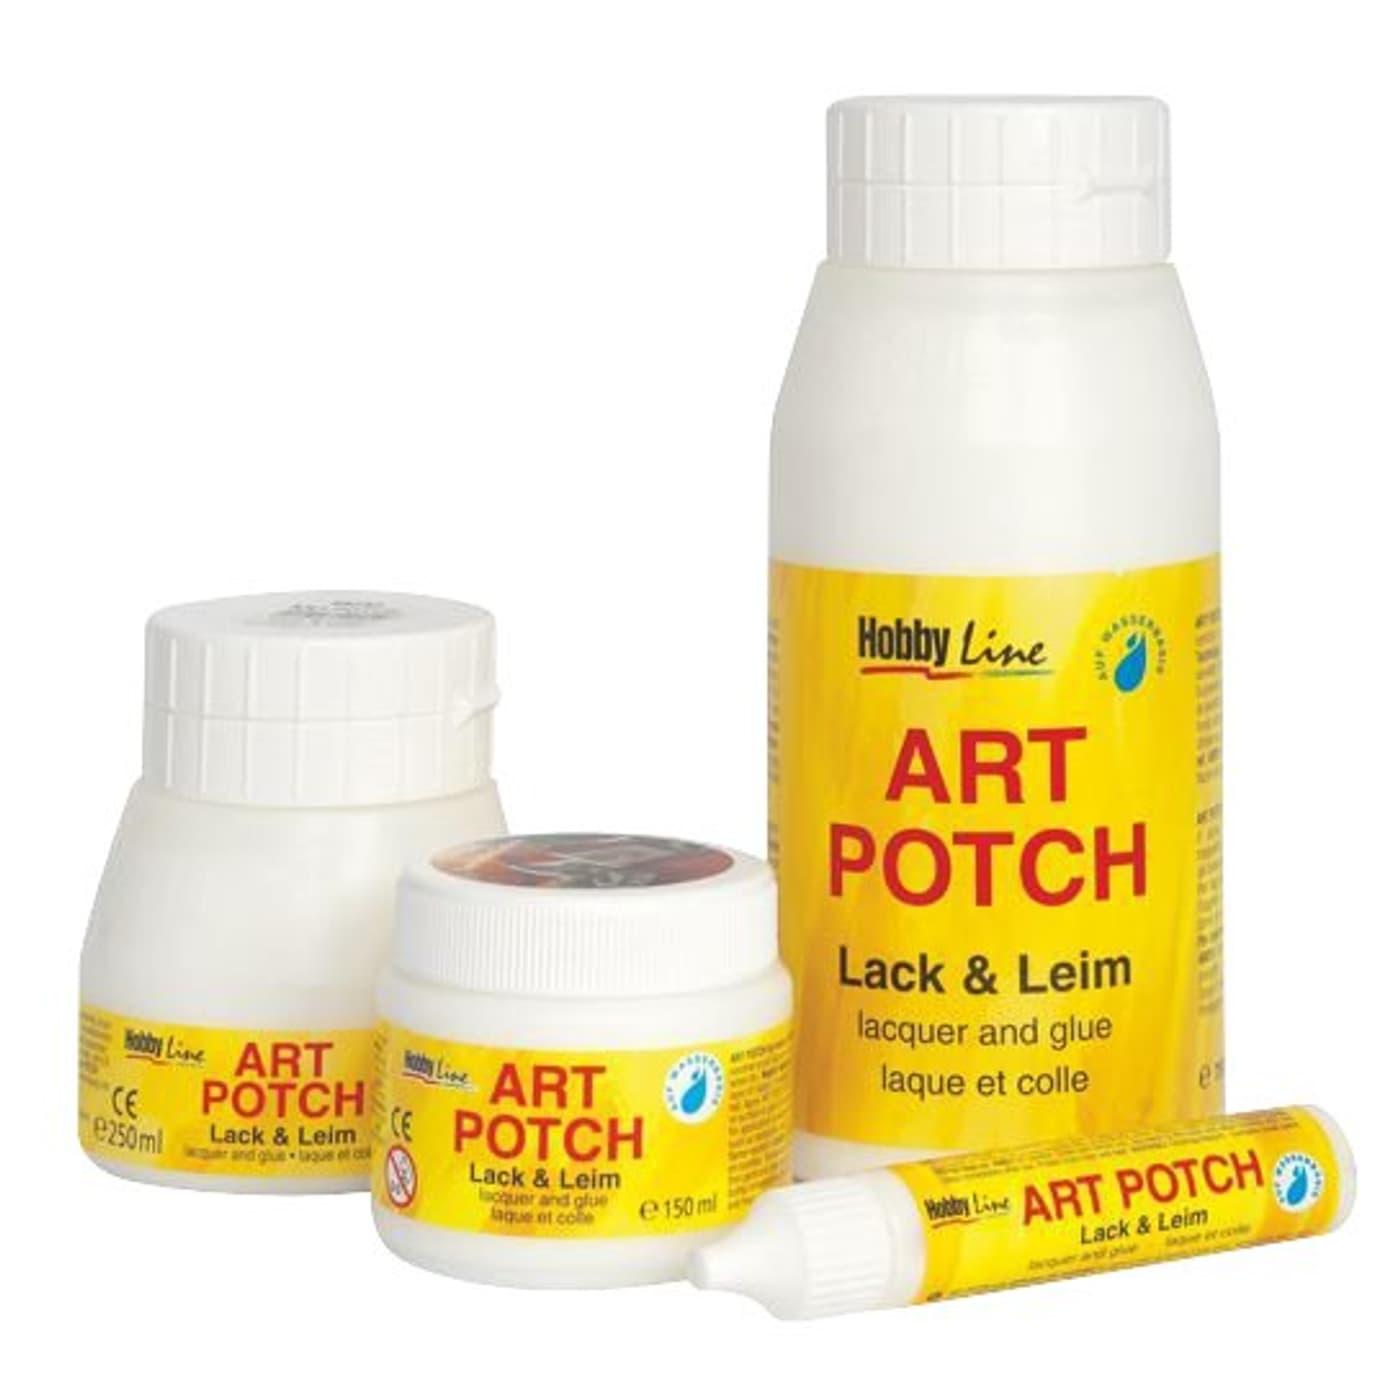 c.kreul art potch lack & leim | migros